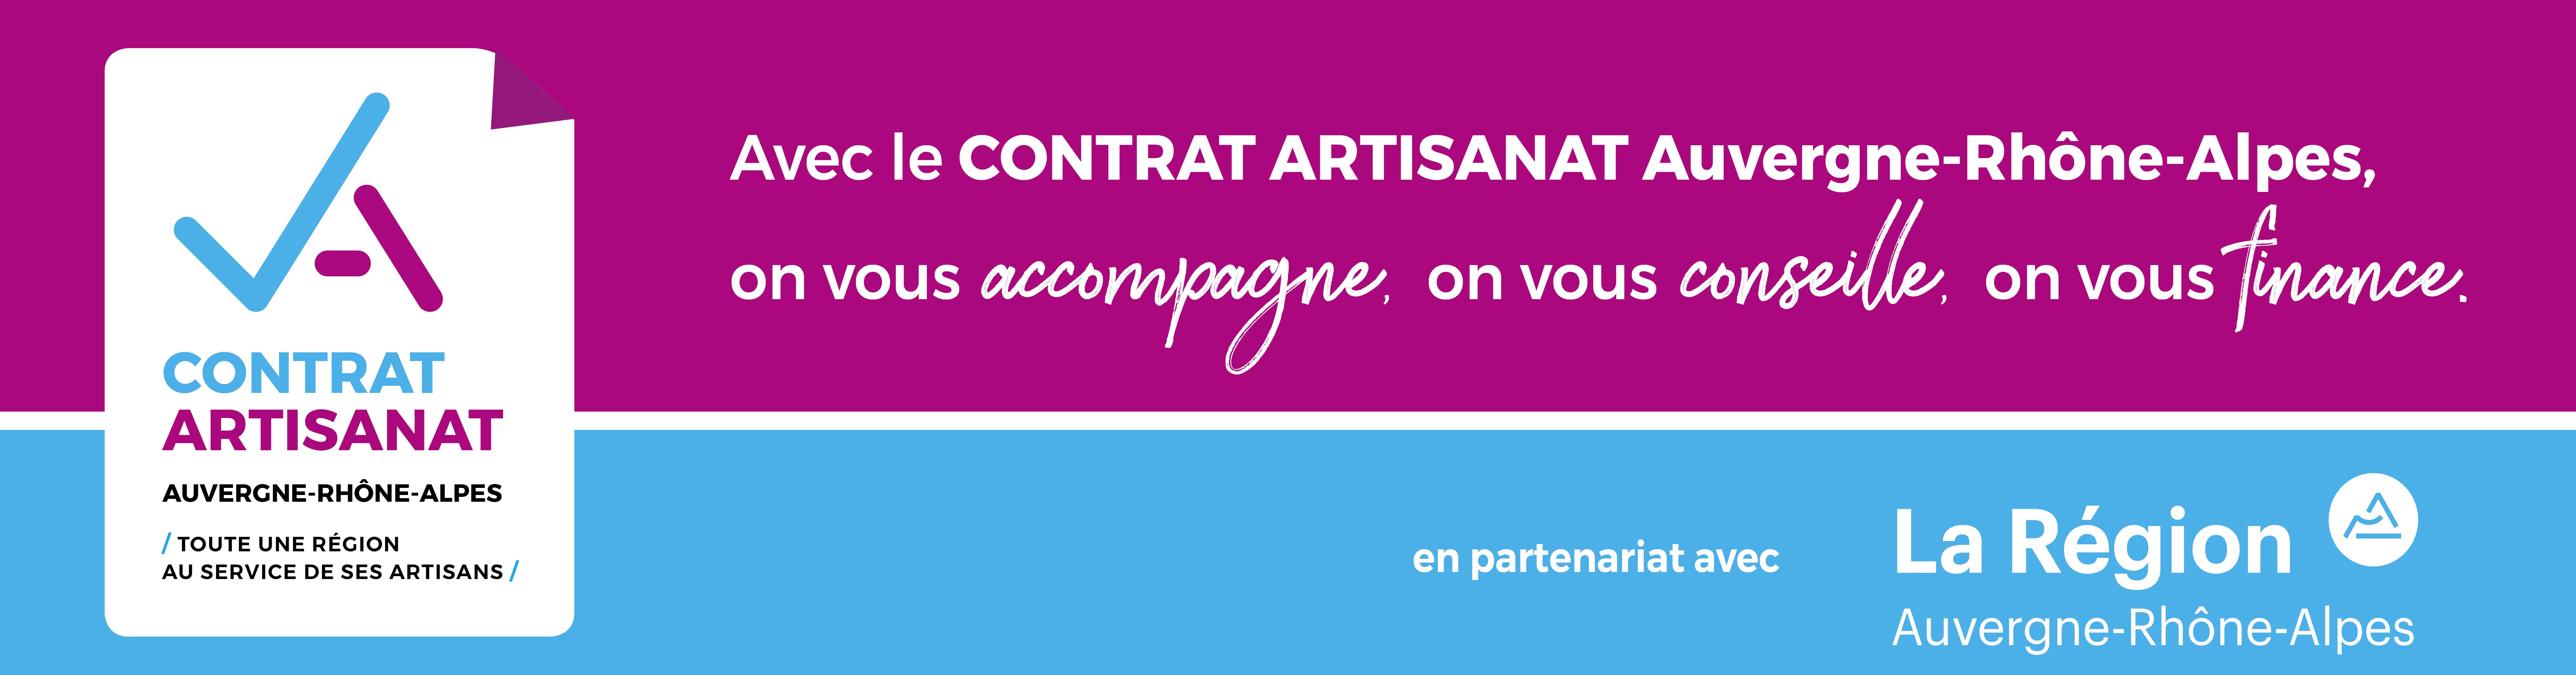 slide_contrat_artisanat.png